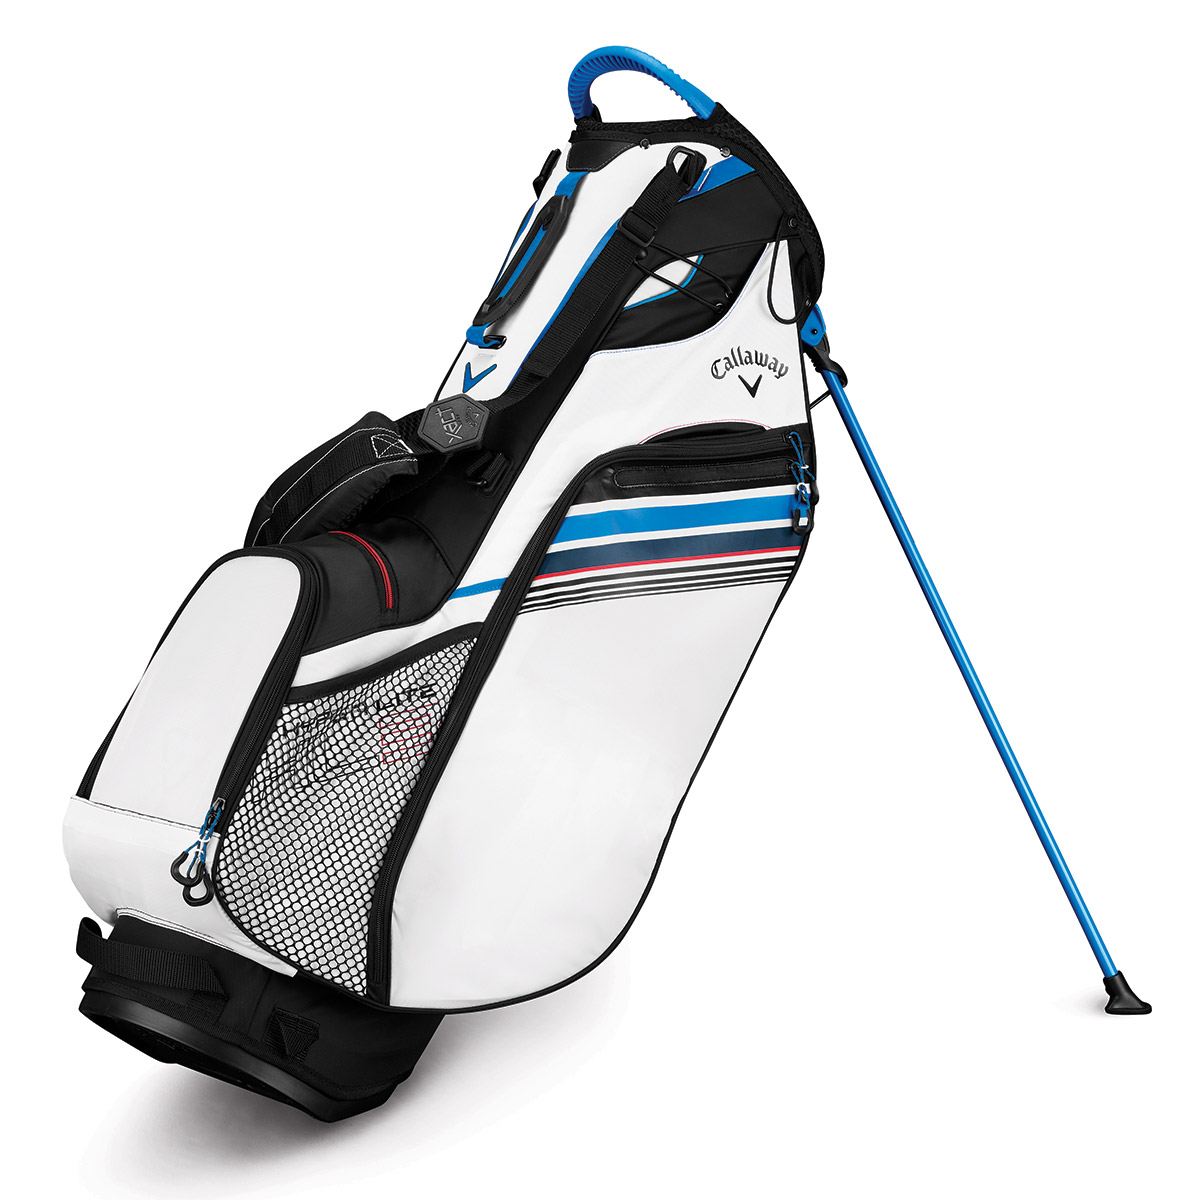 Callaway Golf Hyper Lite 3 Stand Bag 2019 From American Golf